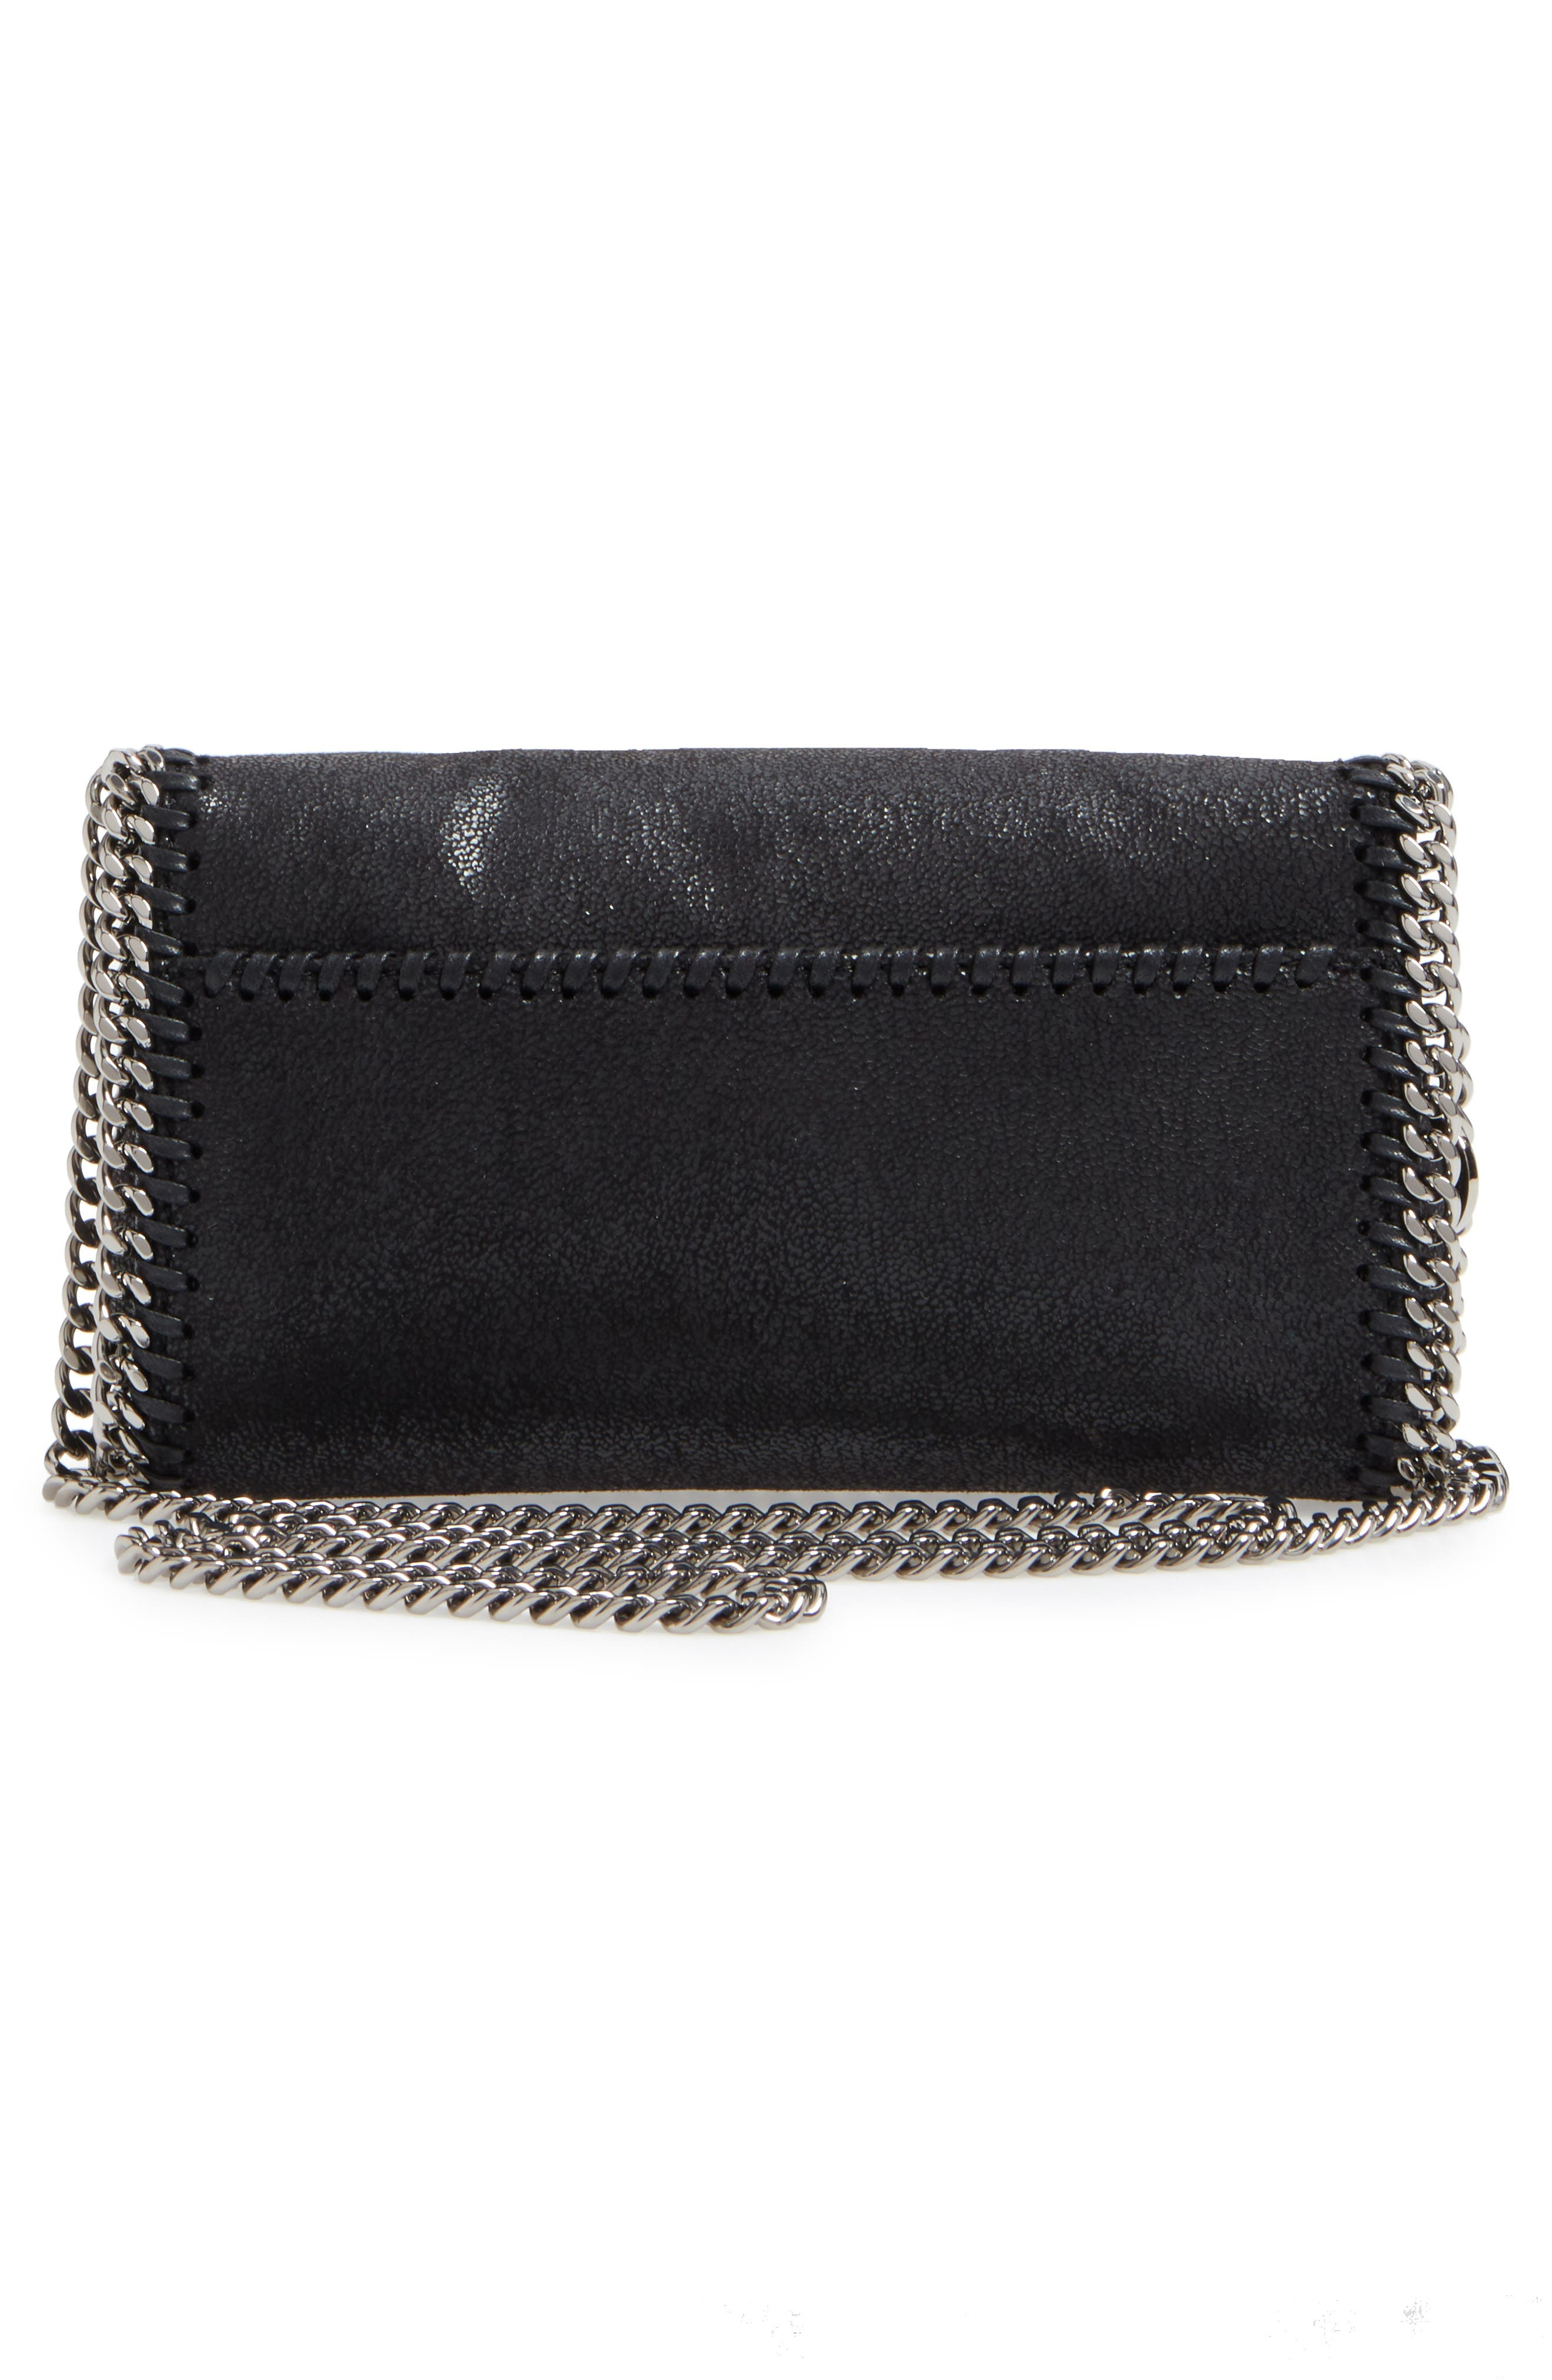 Alternate Image 3  - Stella McCartney Small Fallabella Crystal Faux Leather Crossbody Bag